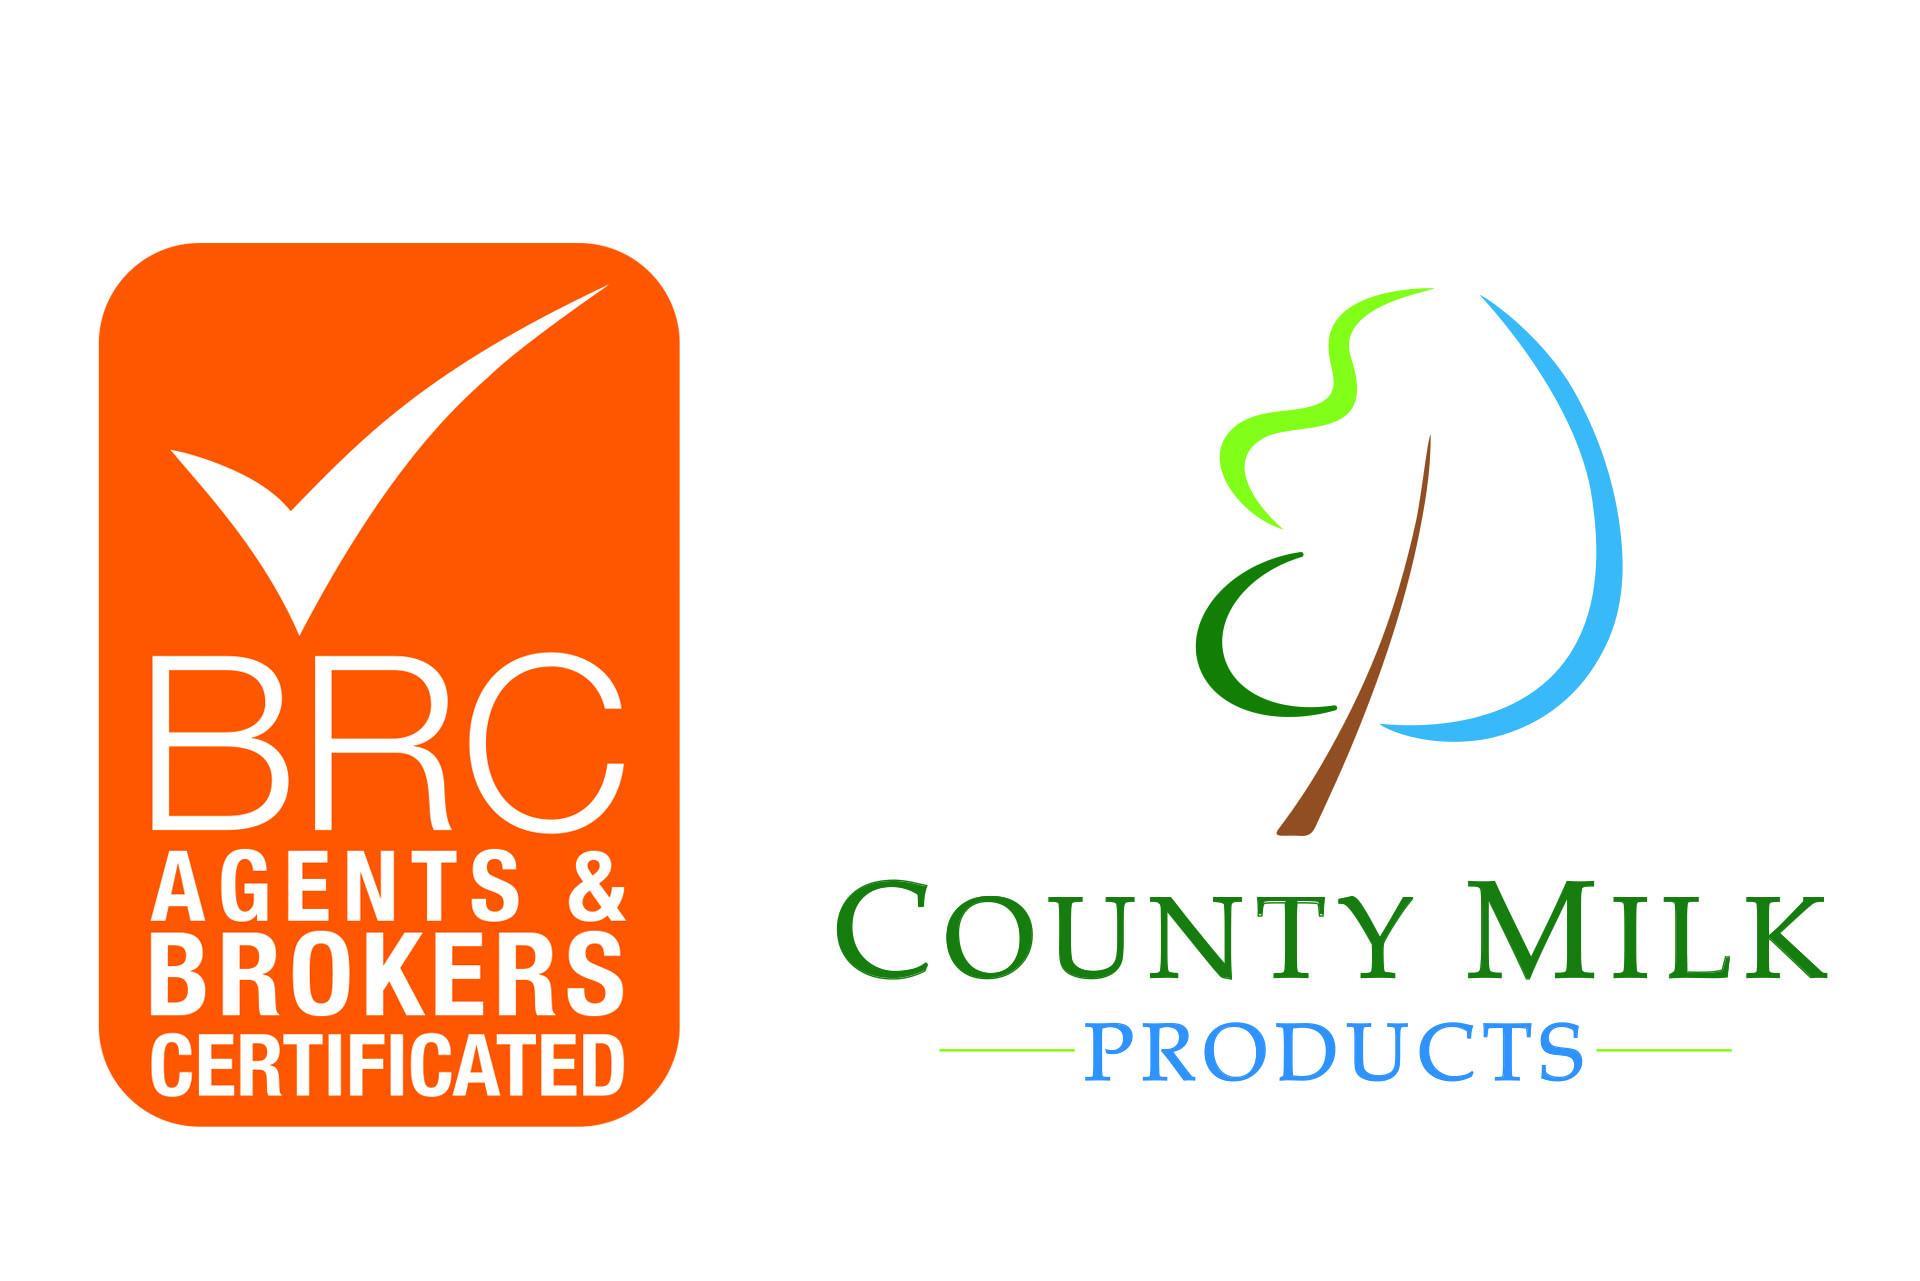 brc certification milk cmp county logos